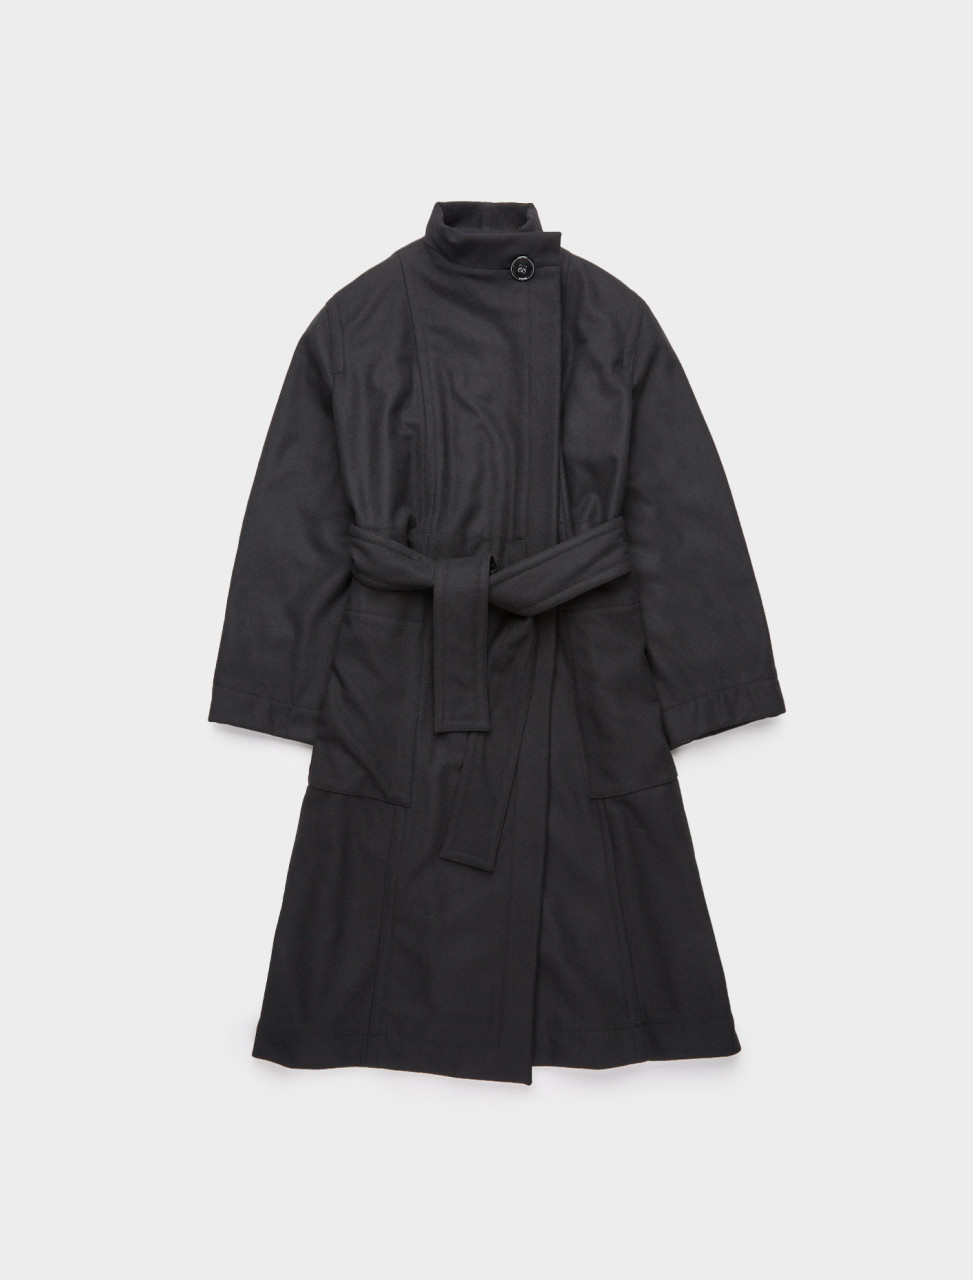 218-W-203-CO250-LF393-999 LEMAIRE WRAP OVER COAT BLACK